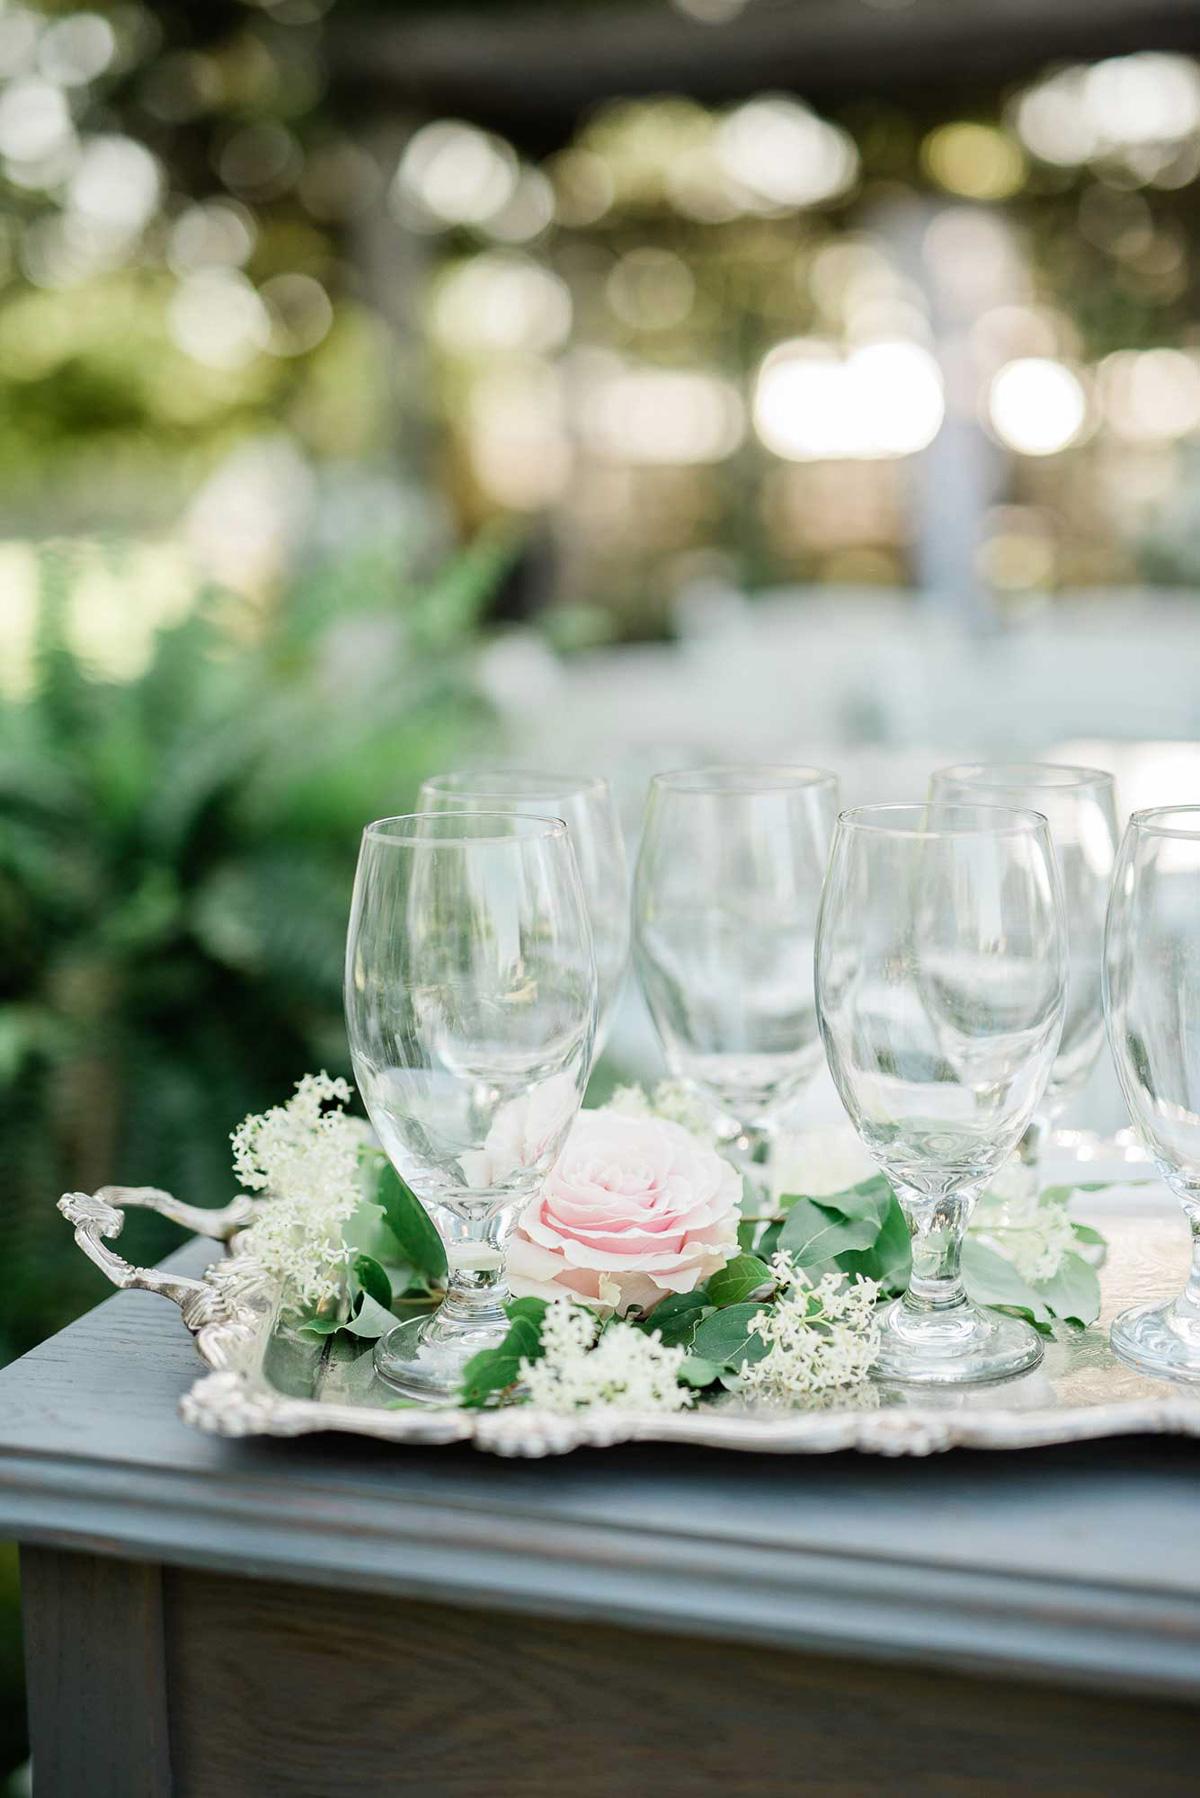 destiny-dawn-photography-vineyard-bride-swish-list-knollwood-golf-and-country-club-ancaster-wedding-editorial-8.jpg